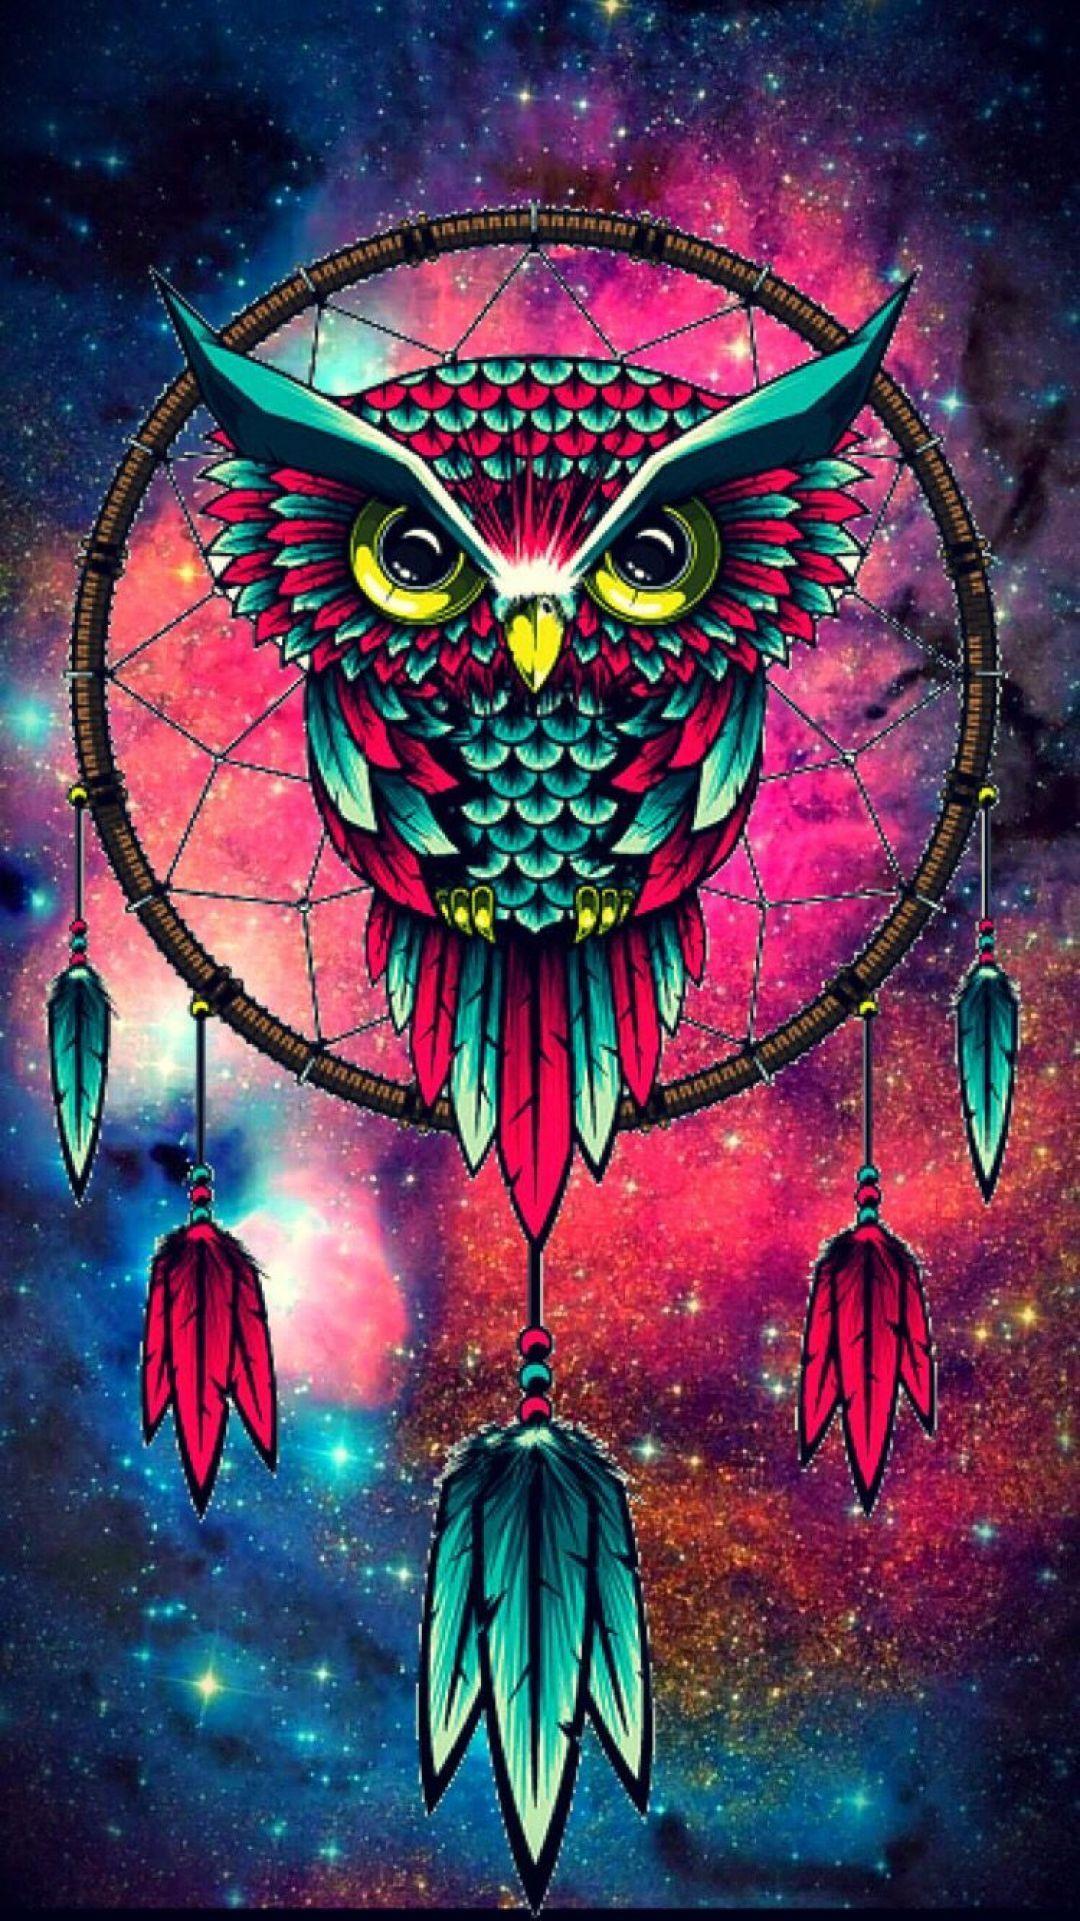 Cute Owl Android Iphone Desktop Hd Backgrounds Wallpapers 1080p 4k 104778 Hdwallpapers Androidwa Owl Wallpaper Dreamcatcher Wallpaper Owl Mandala